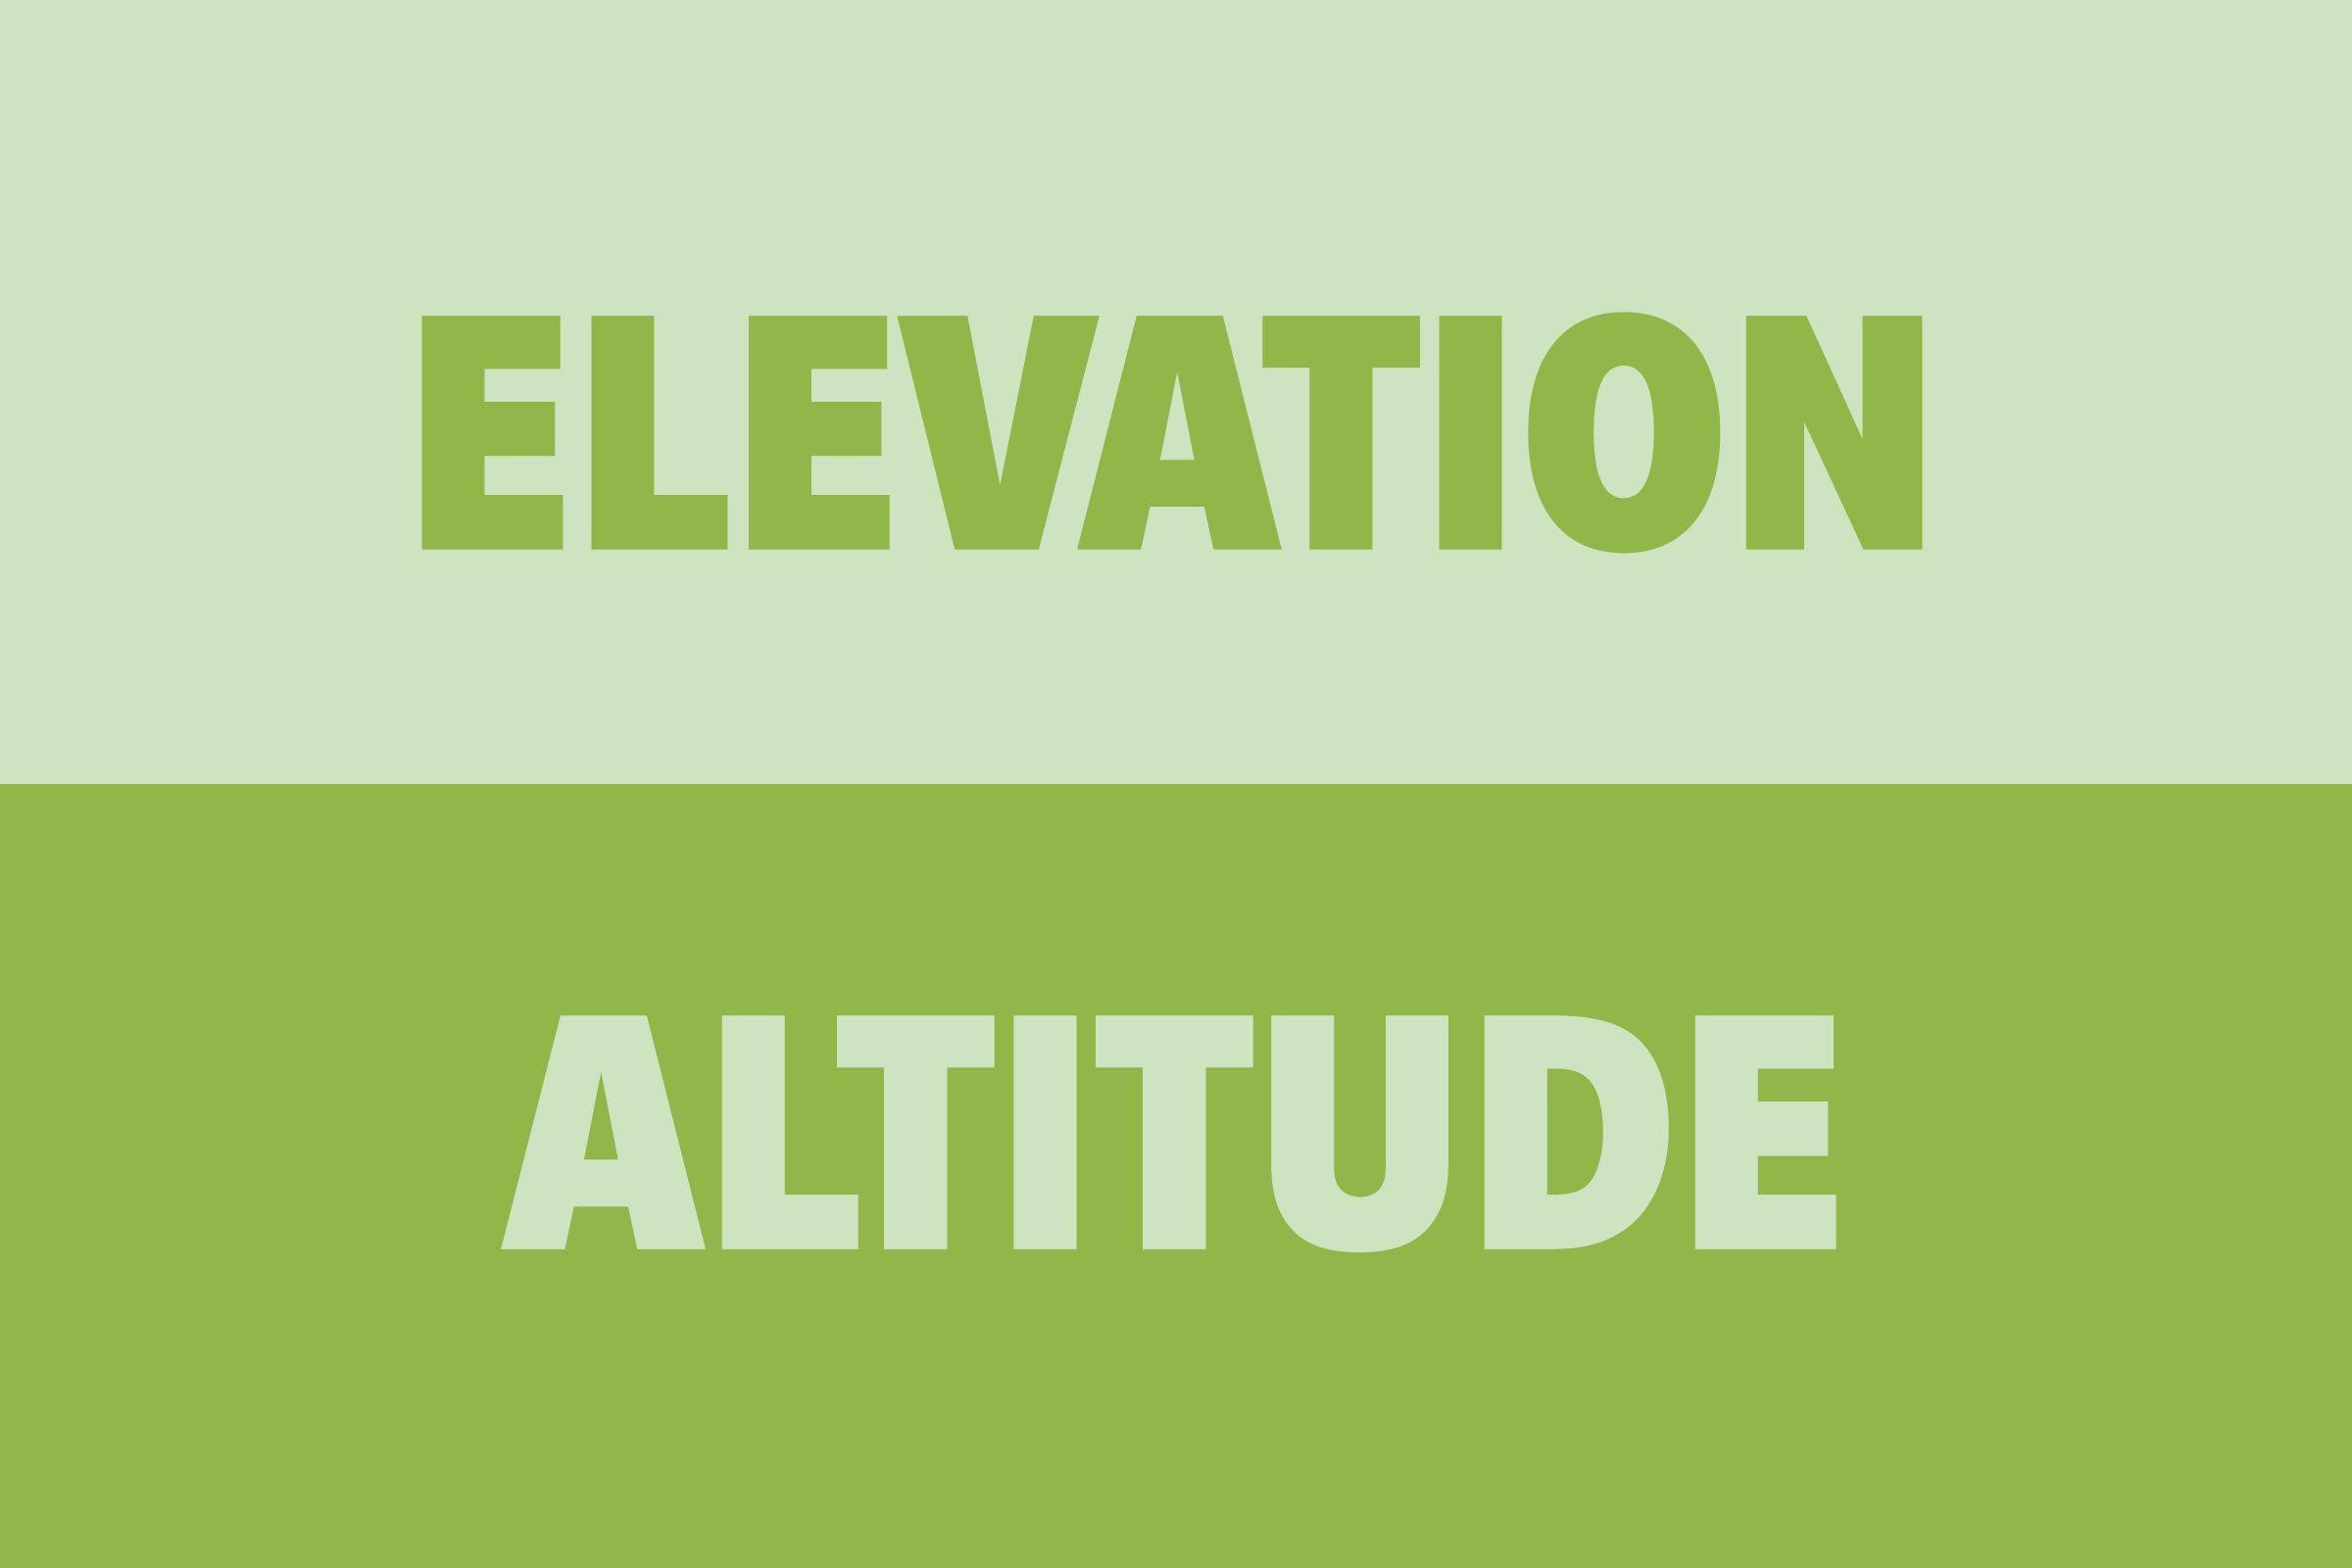 Elevation vs Altitude